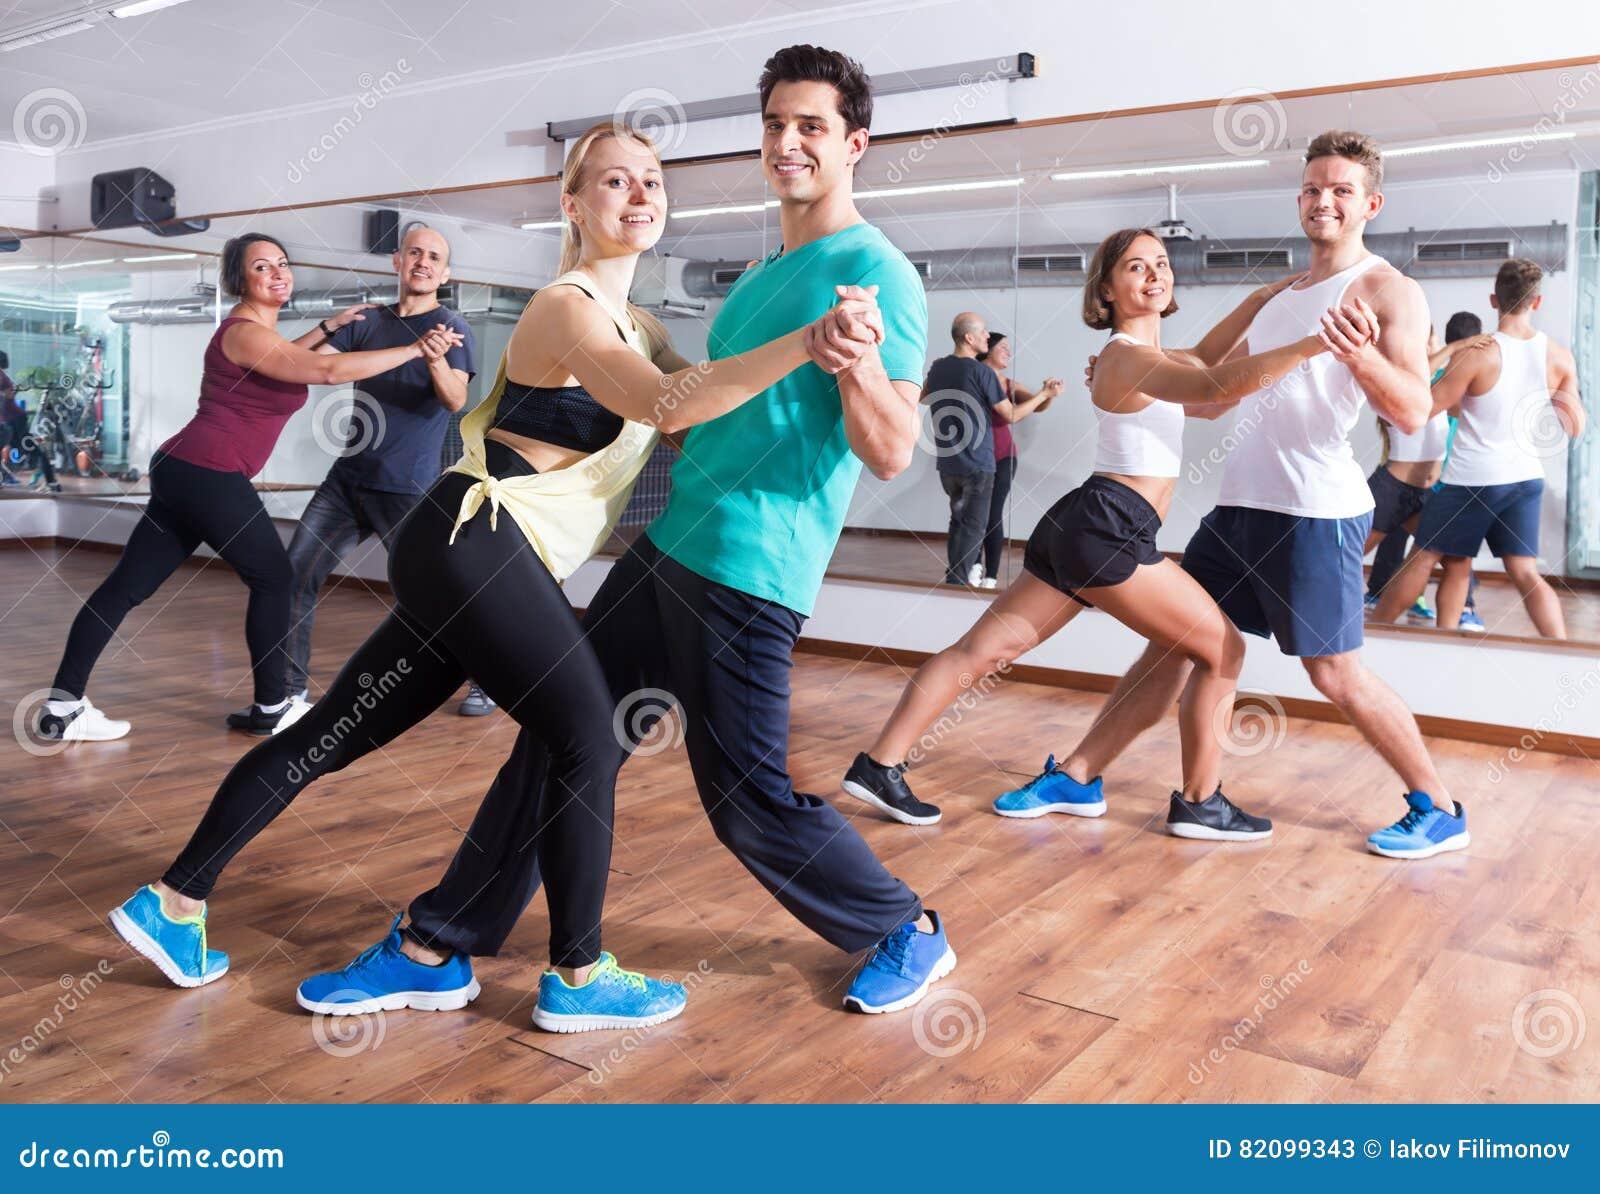 Men and women dancing salsa o bachata